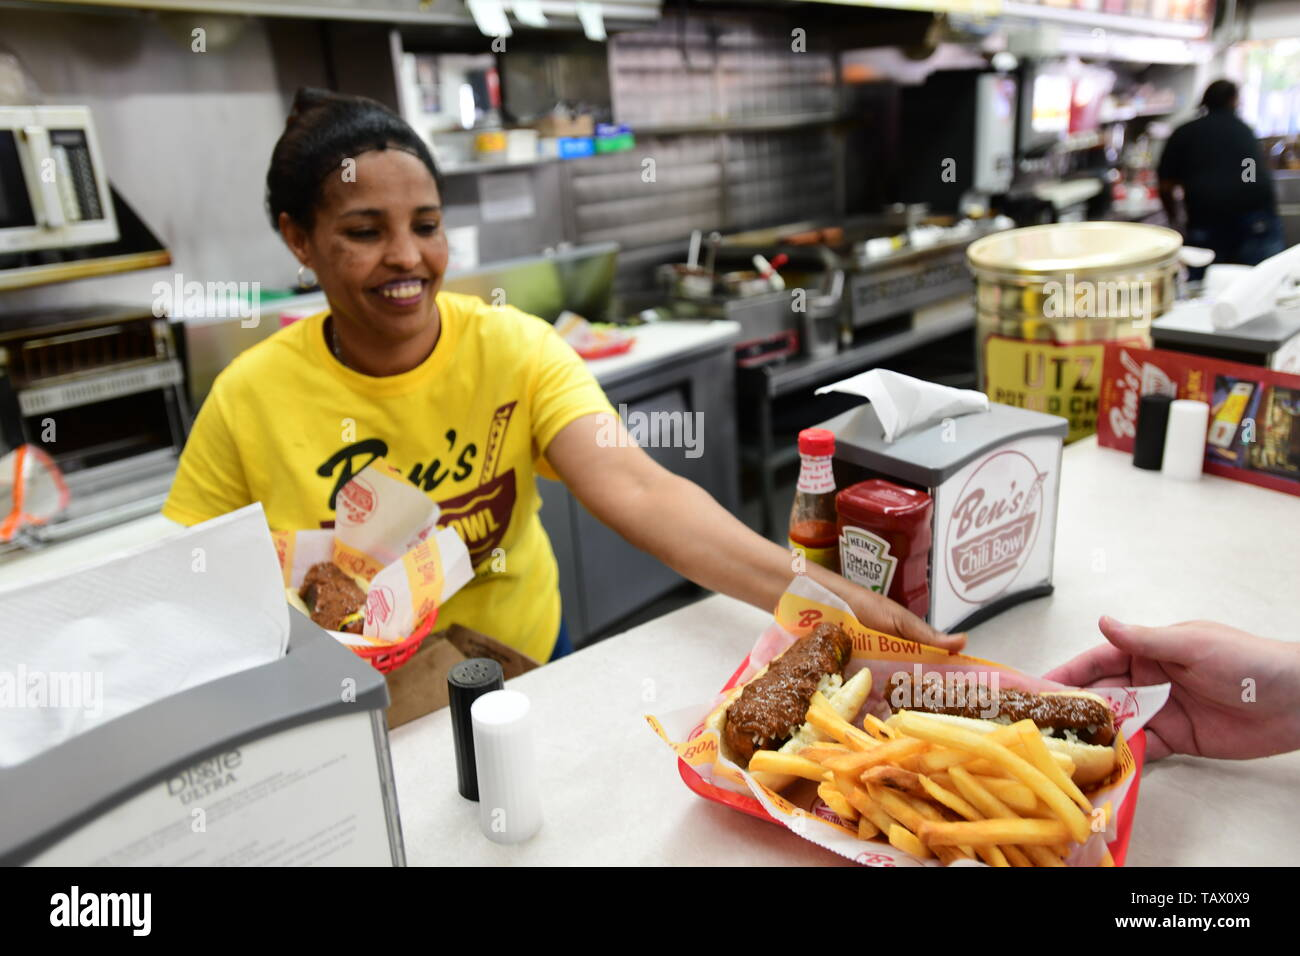 usa-washington-dc-bens-chili-bowl-a-dc-landmark-restaurant-on-the-u-street-corridor-famous-for-half-smokes-and-chili-TAX0X9.jpg